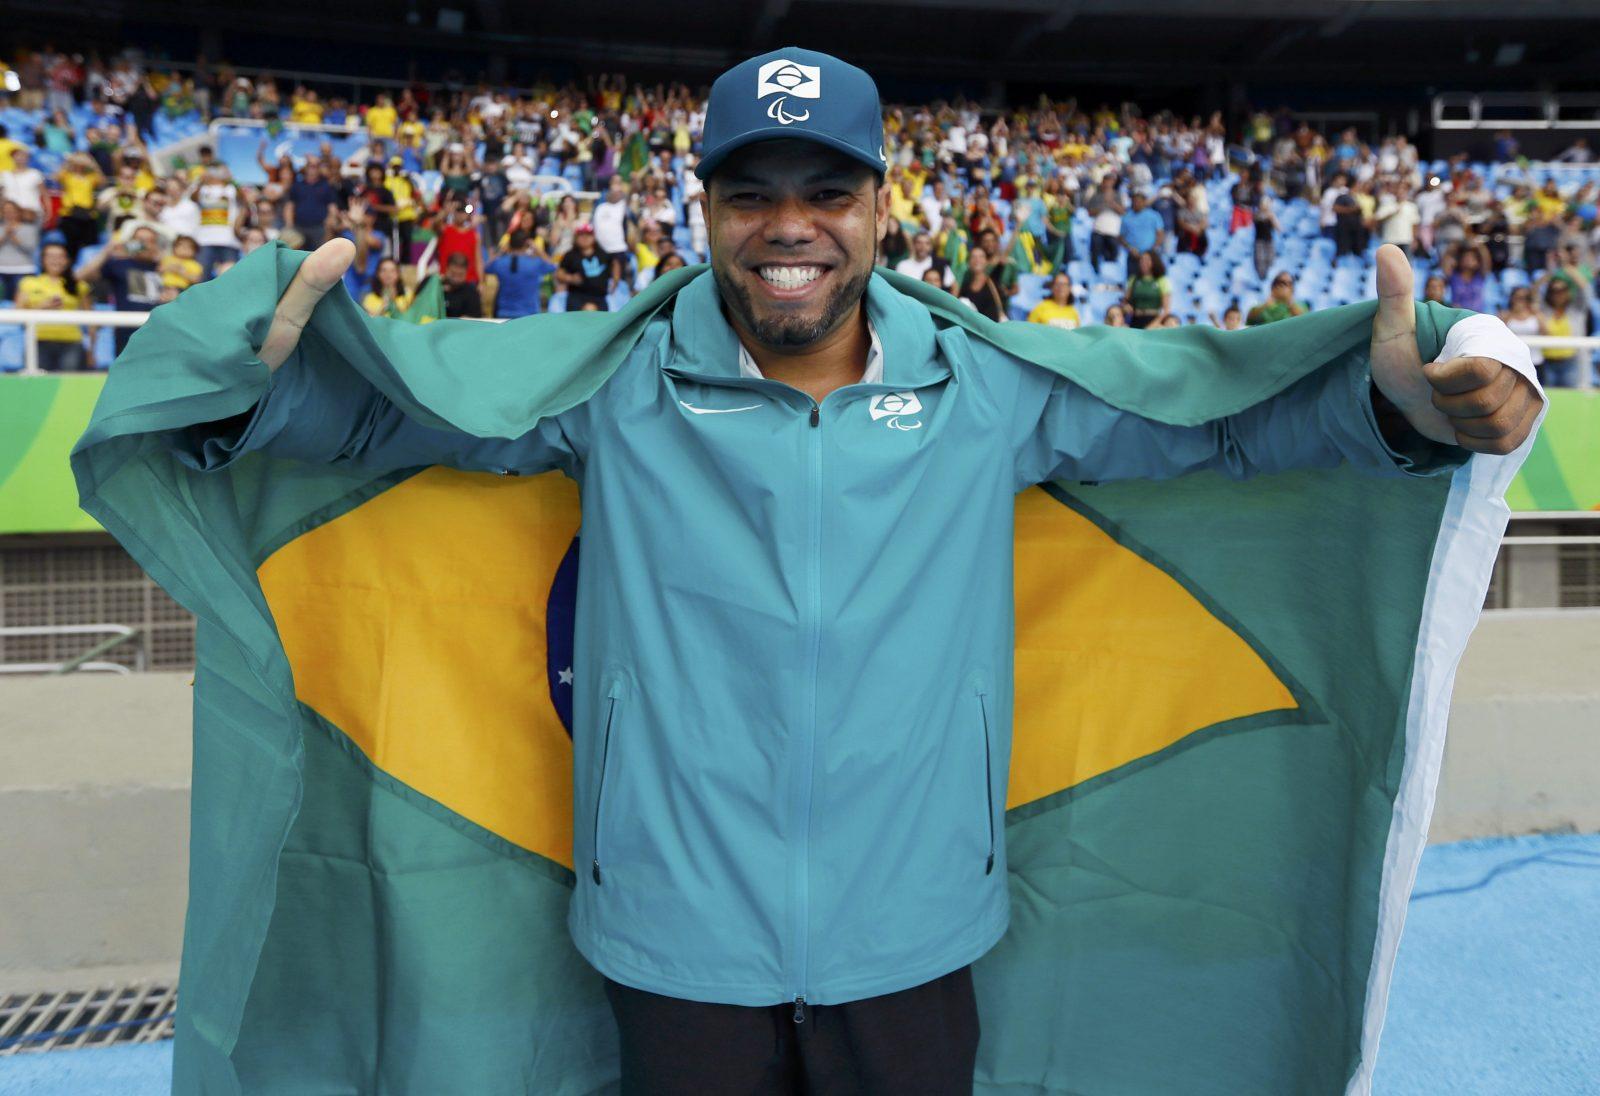 Claudiney Batista conquista inédito ouro no Mundial de atletismo paralímpico